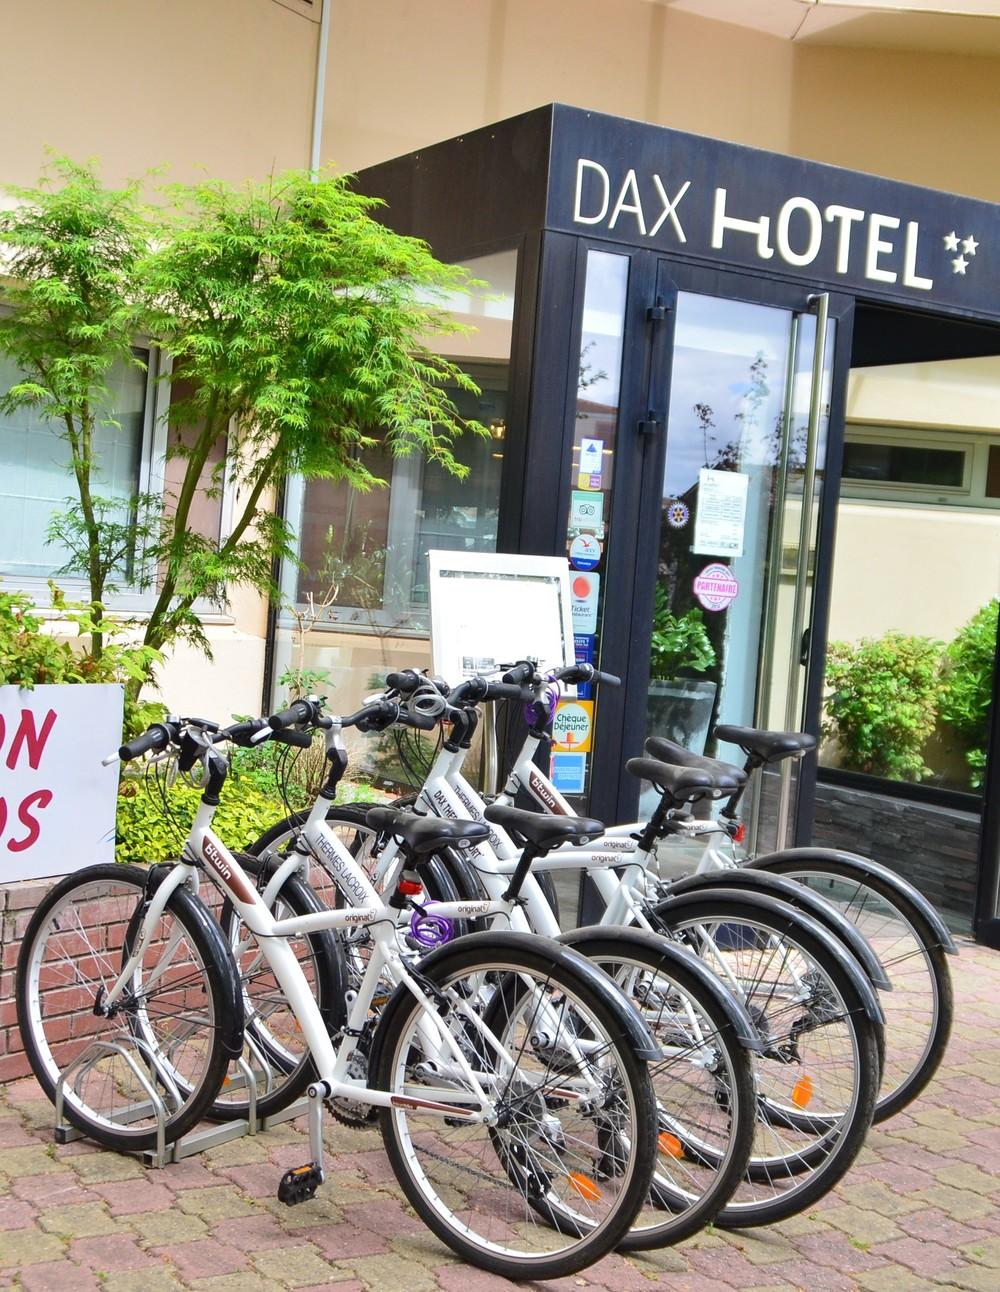 Dax Hotel - Devanture 4.jpg